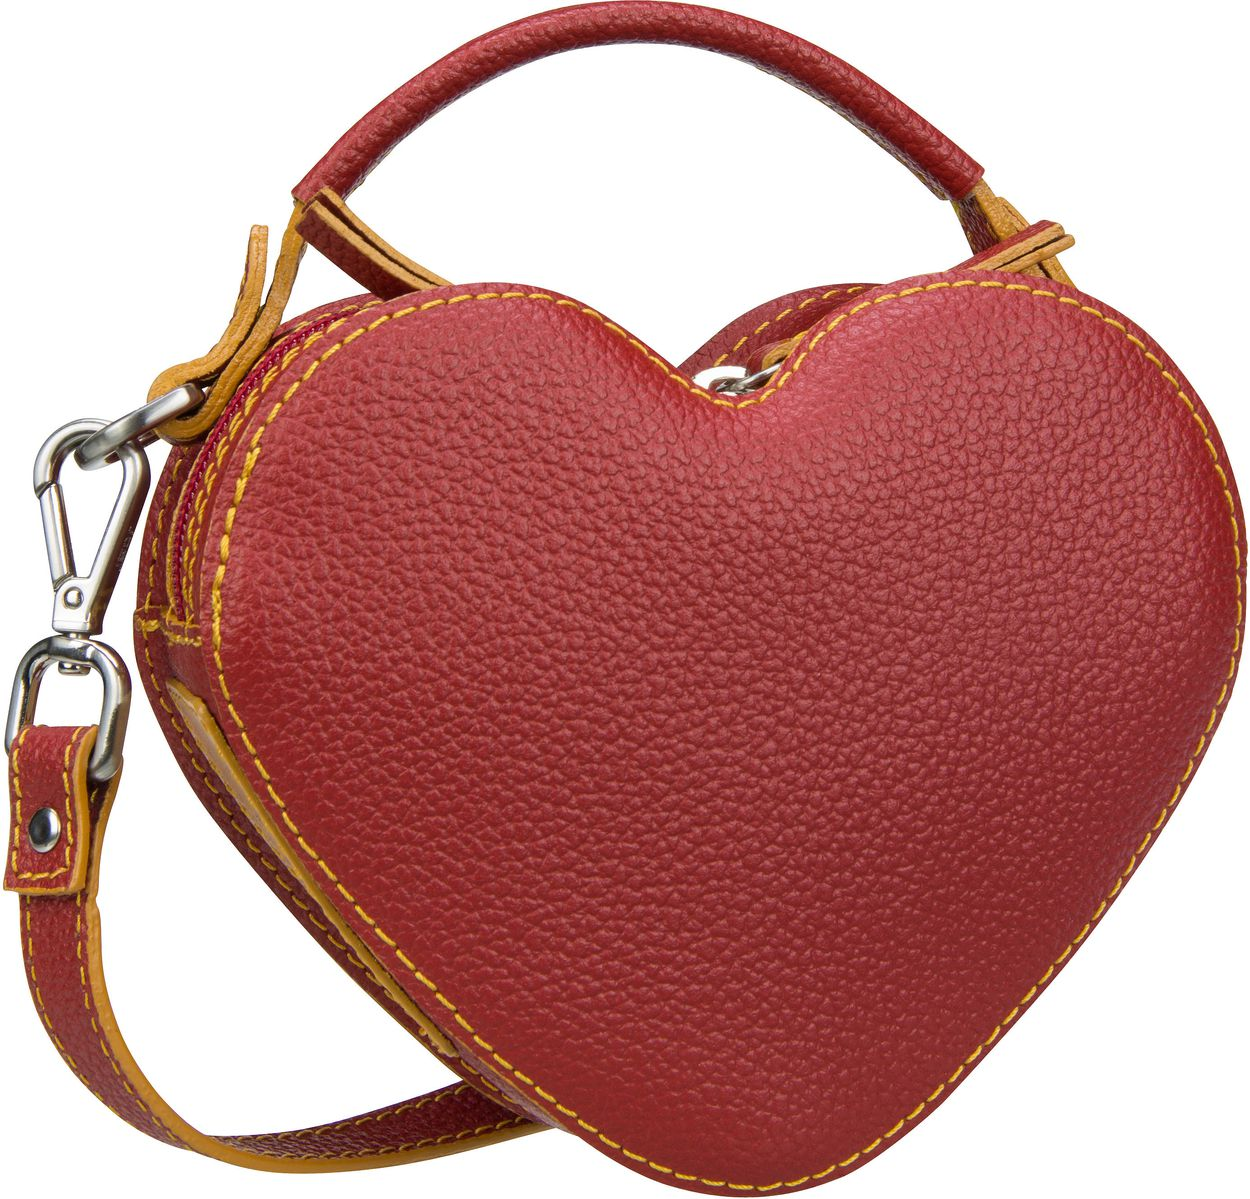 Handtasche Nanda 2611 Umhängetasche Rot